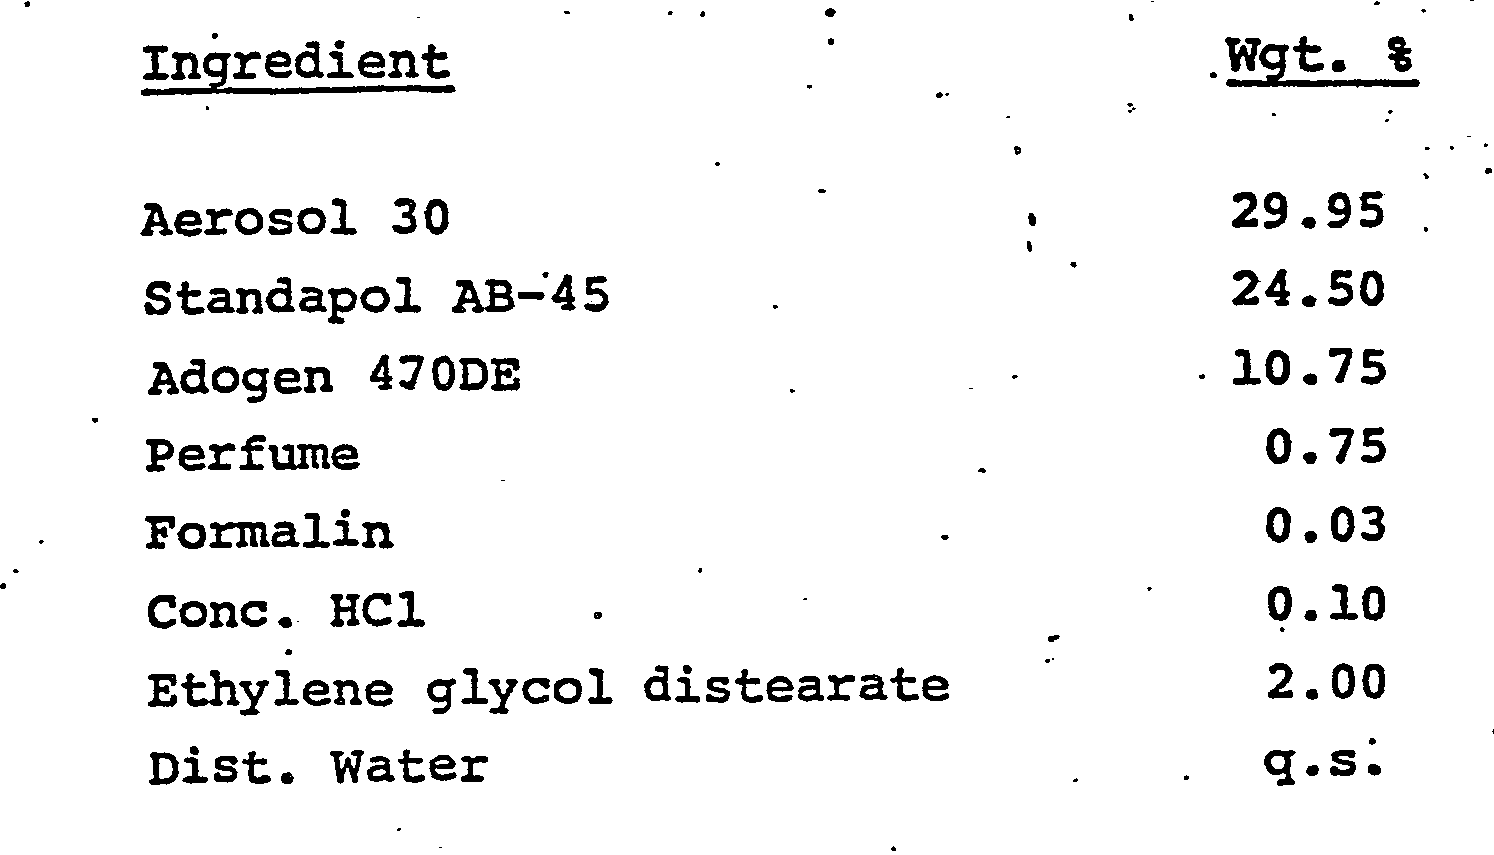 EP0067635A2 - Shampoo compositions - Google Patents